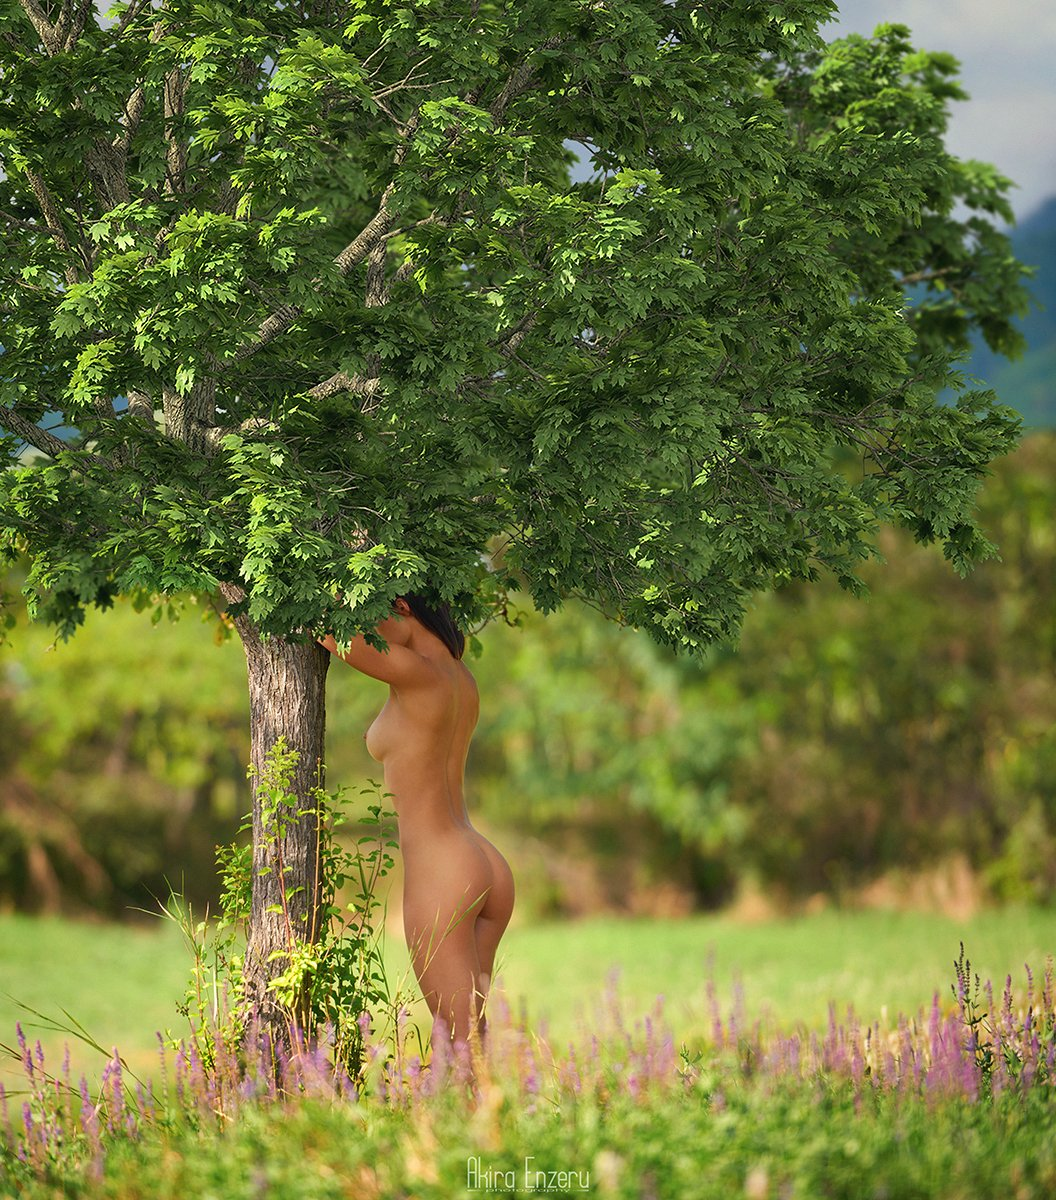 portrait, nude, Akira Enzeru